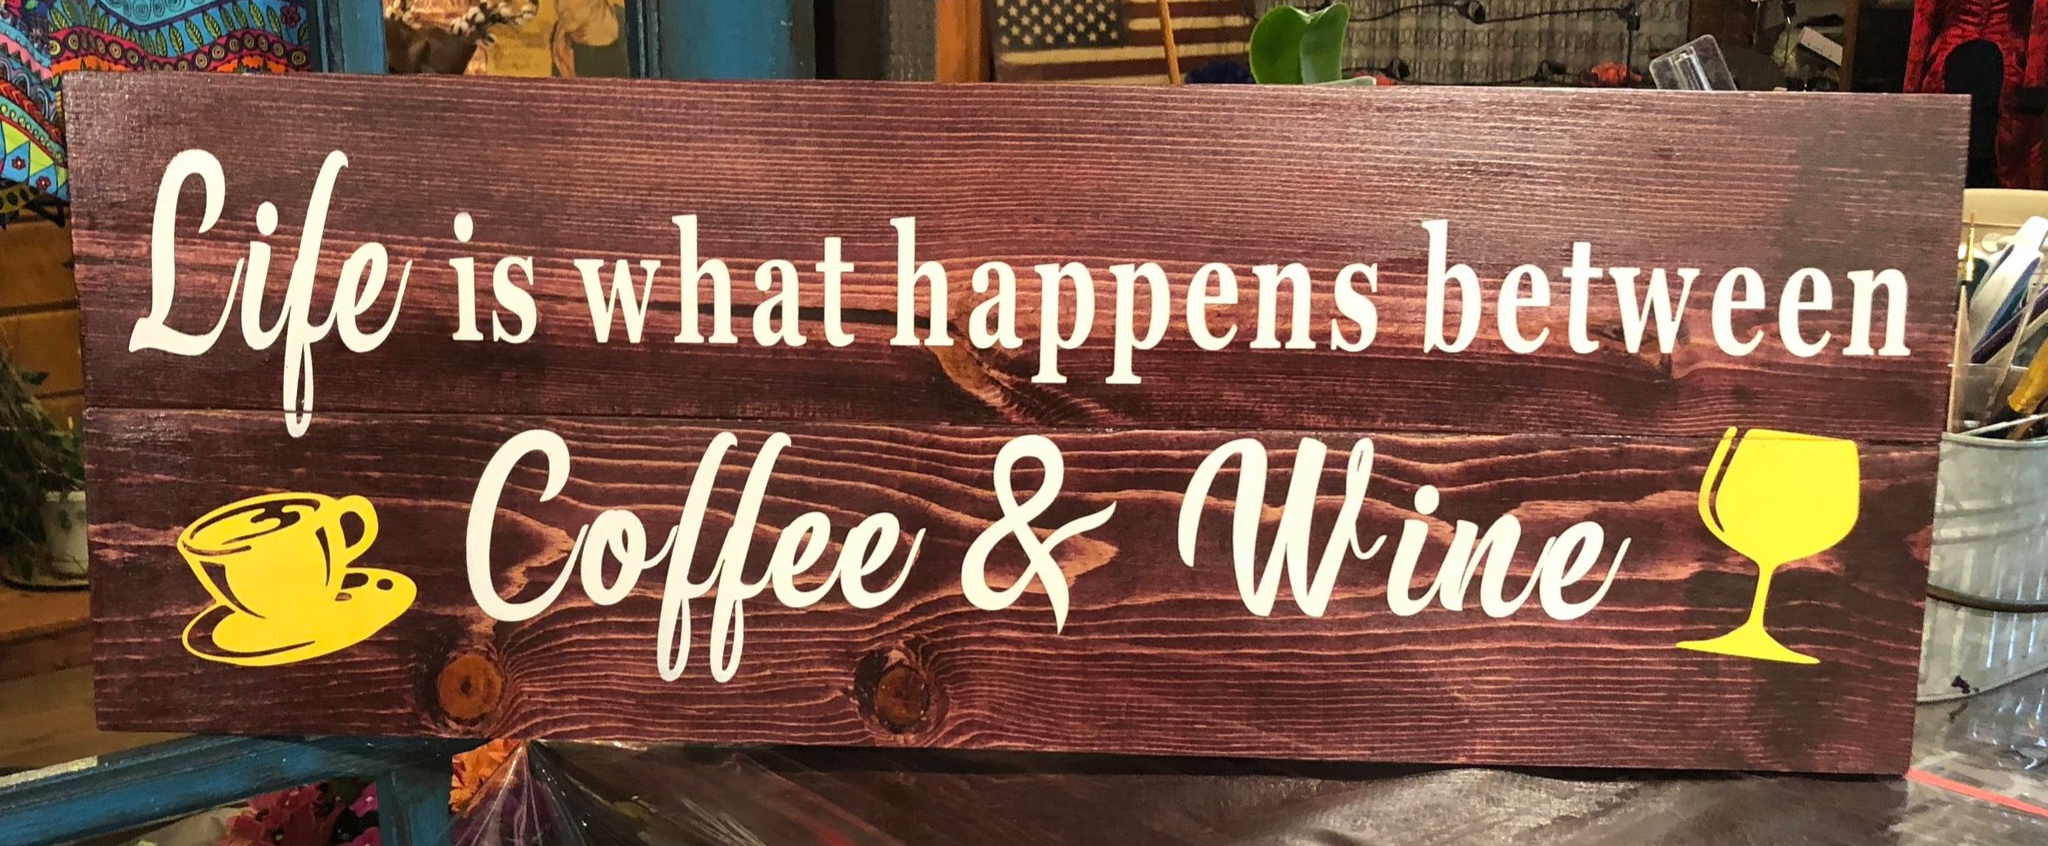 Life is what happens between Coffee..